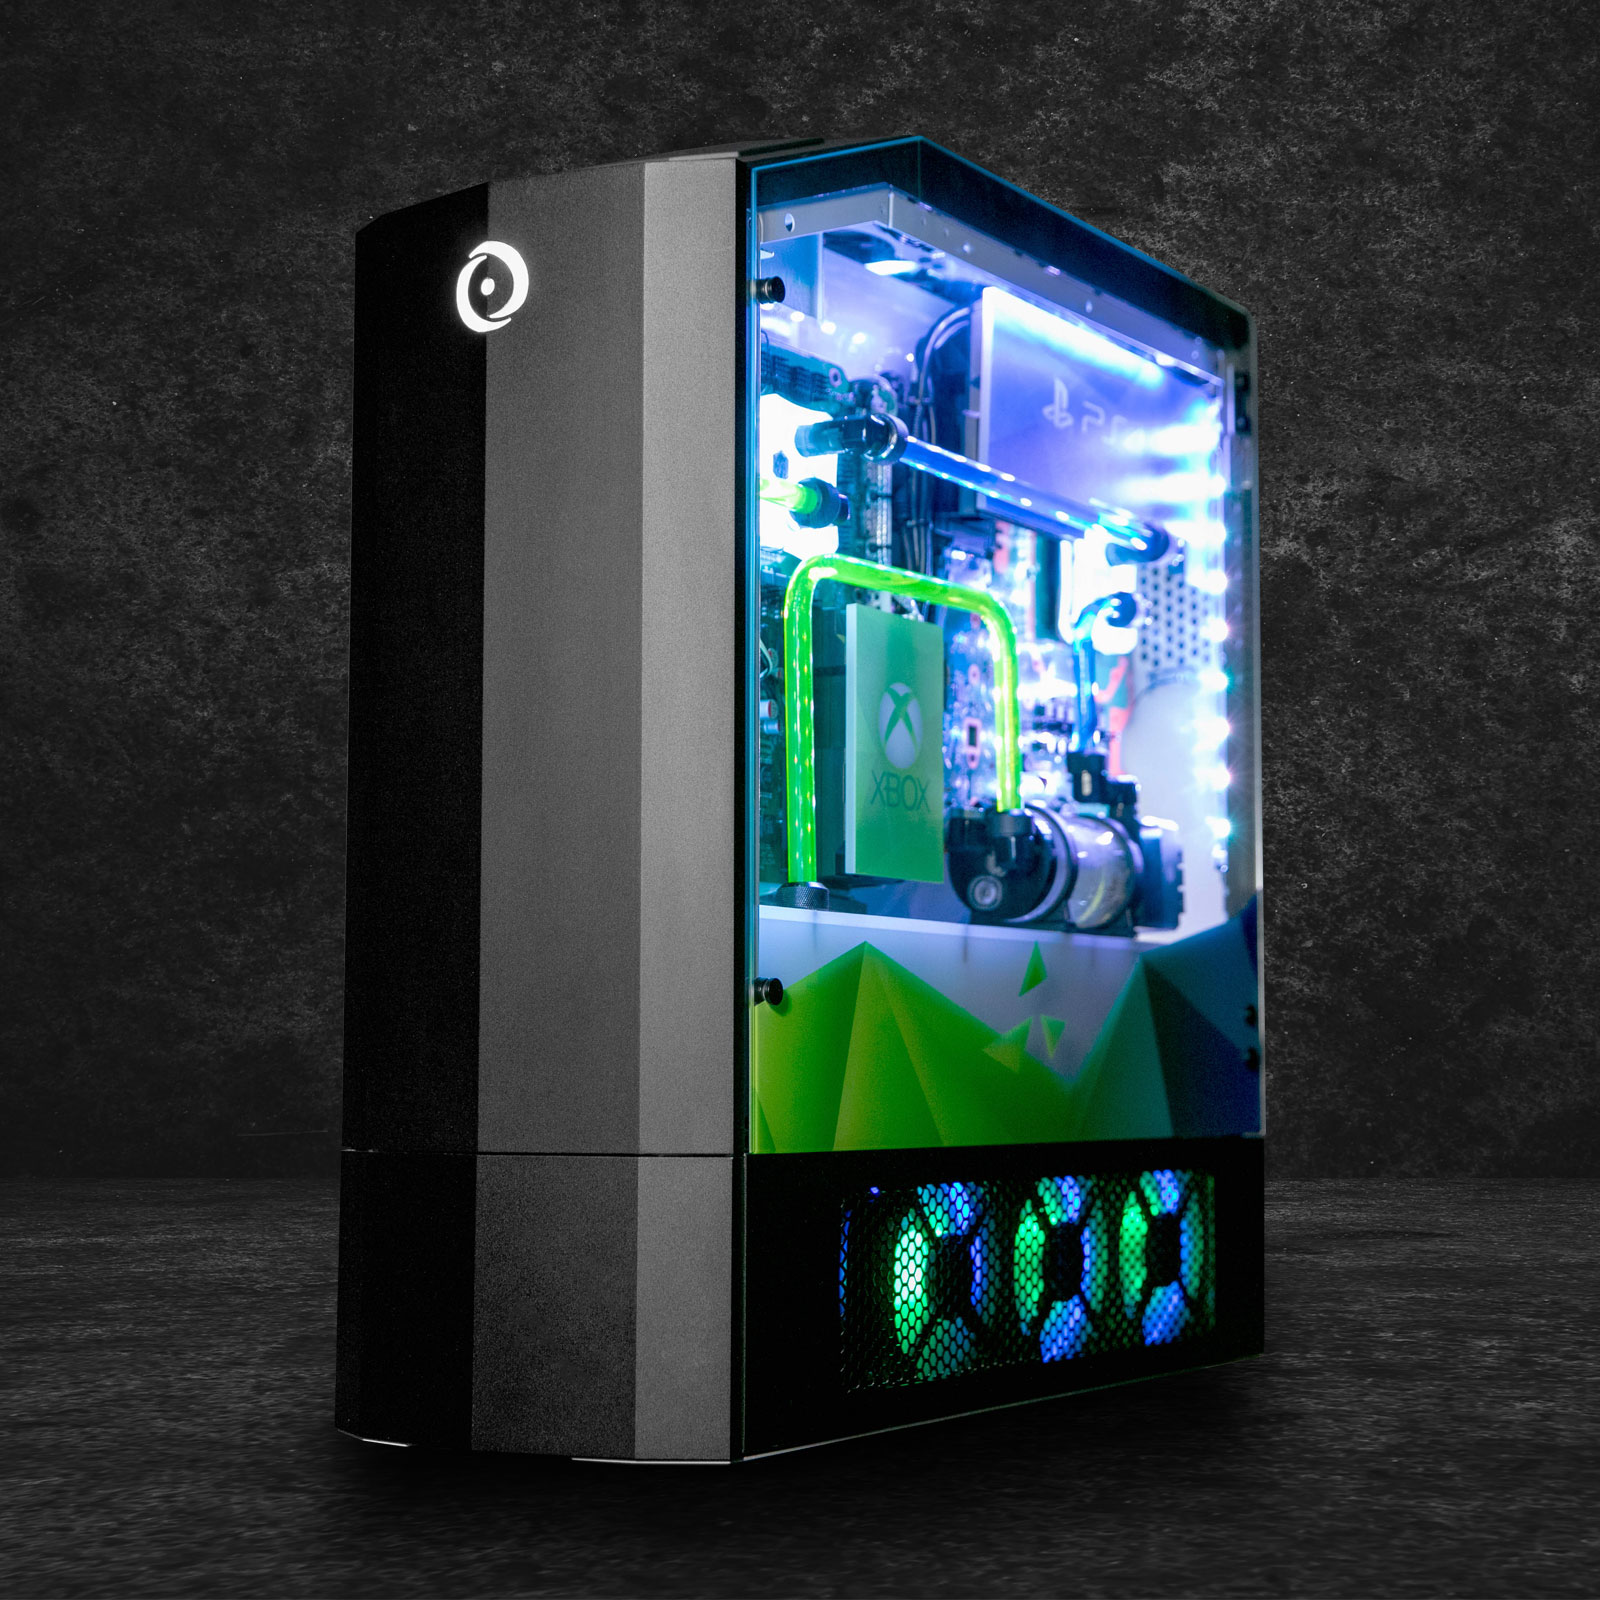 Origin PC Big O